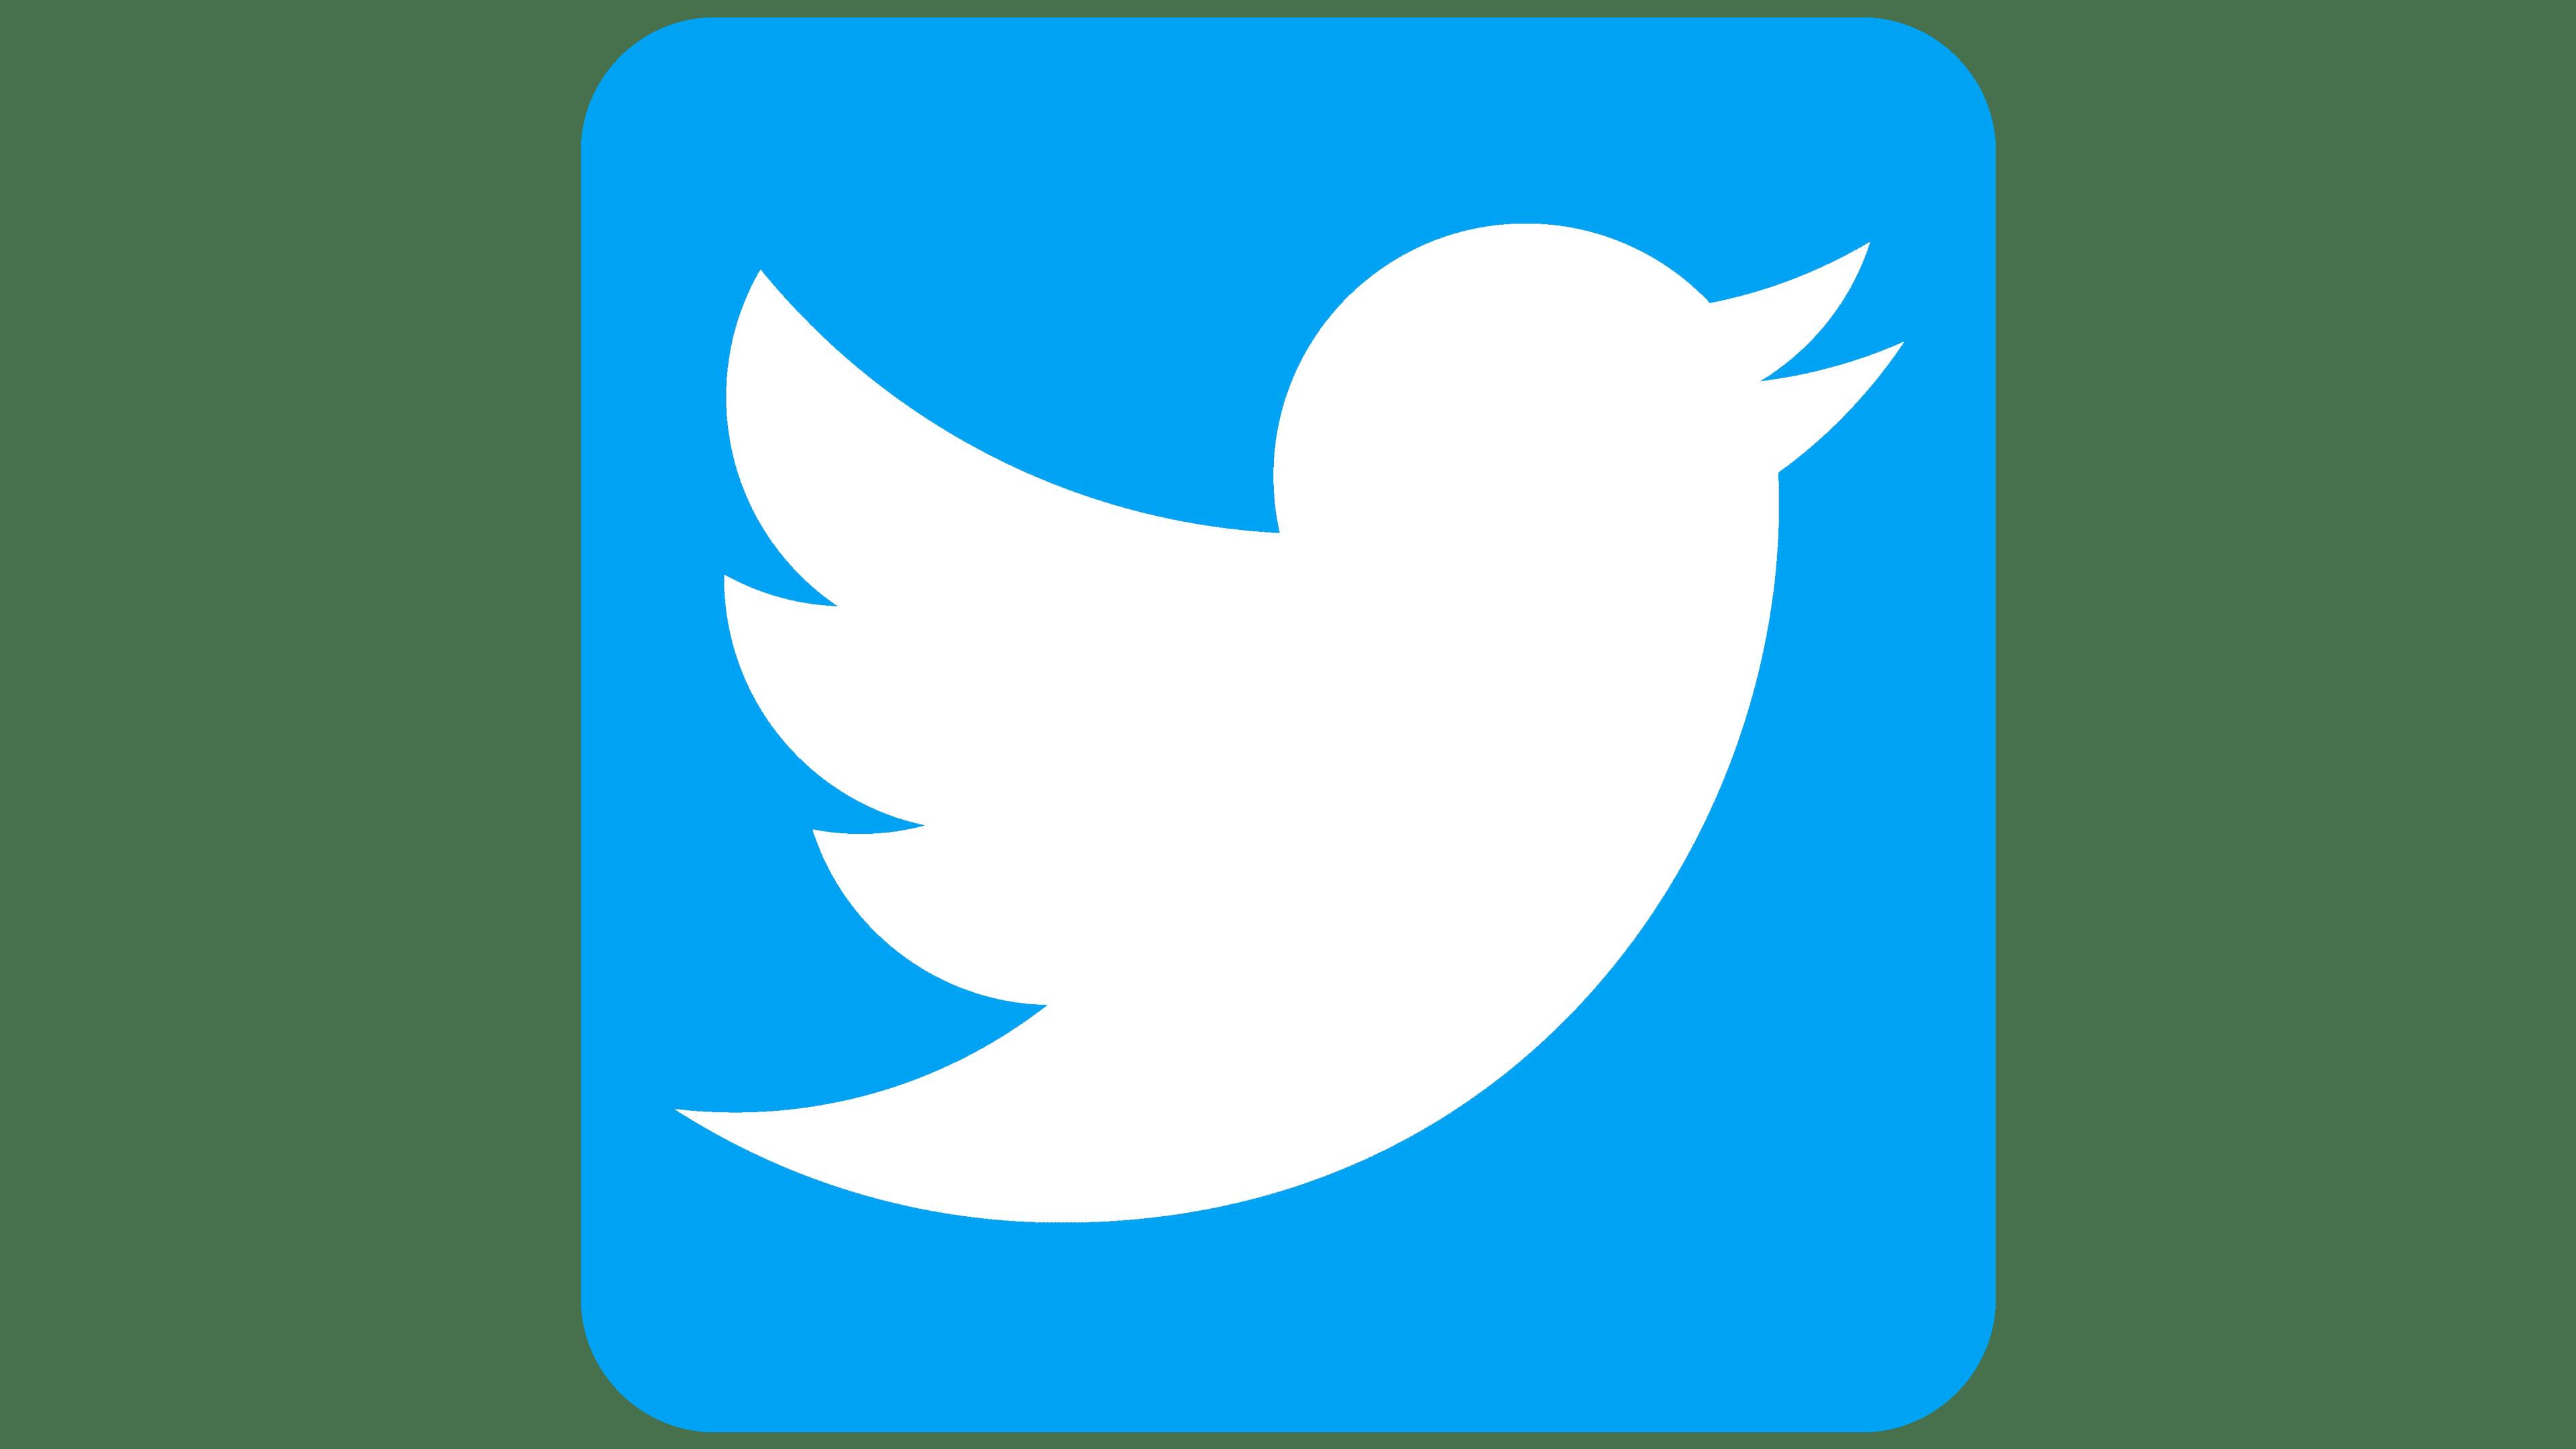 Twitter Emblem